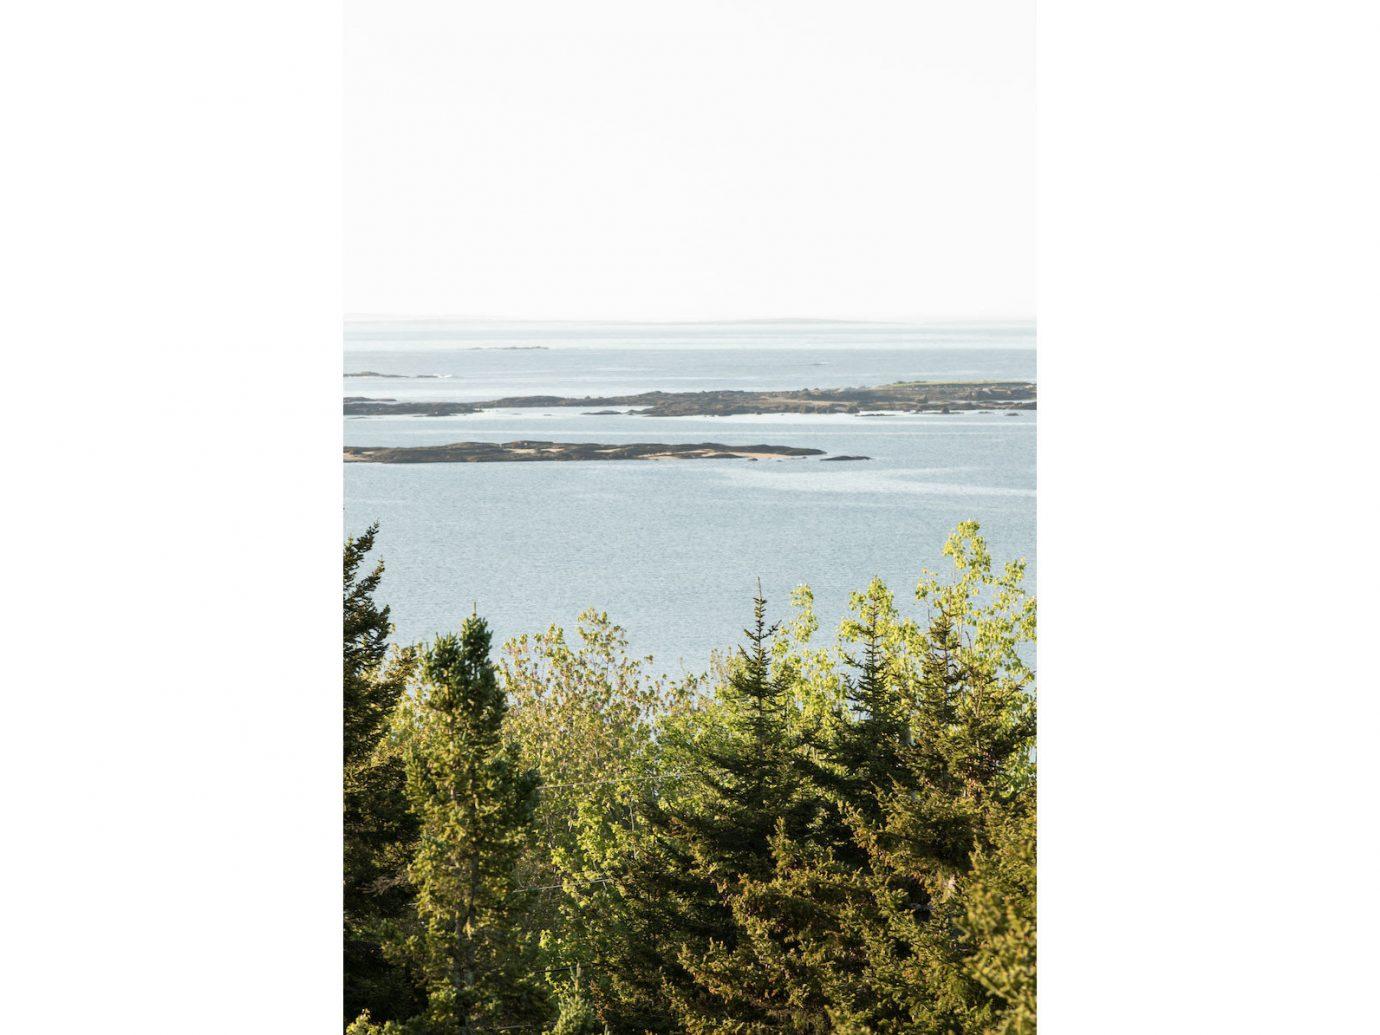 Influencers + Tastemakers ecosystem shore Coast water Sea land lot